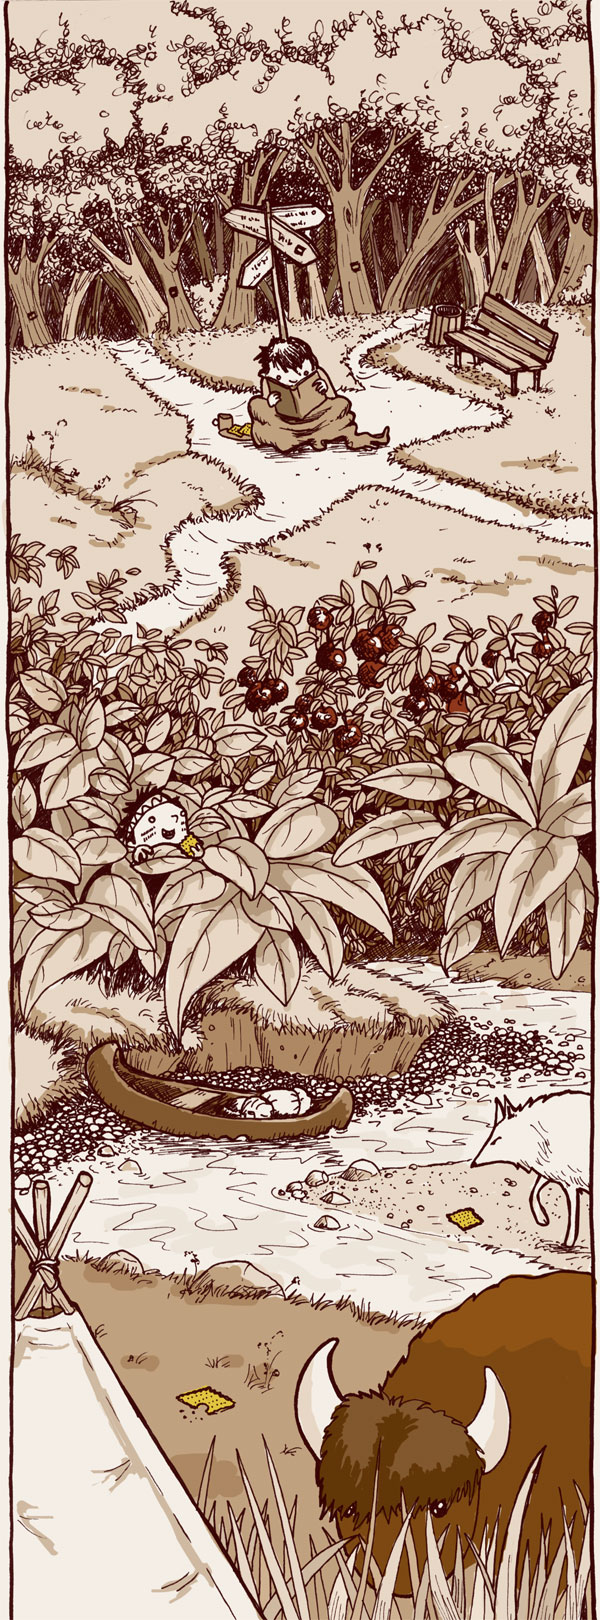 Abenteuer. Illustration von puvo productions.